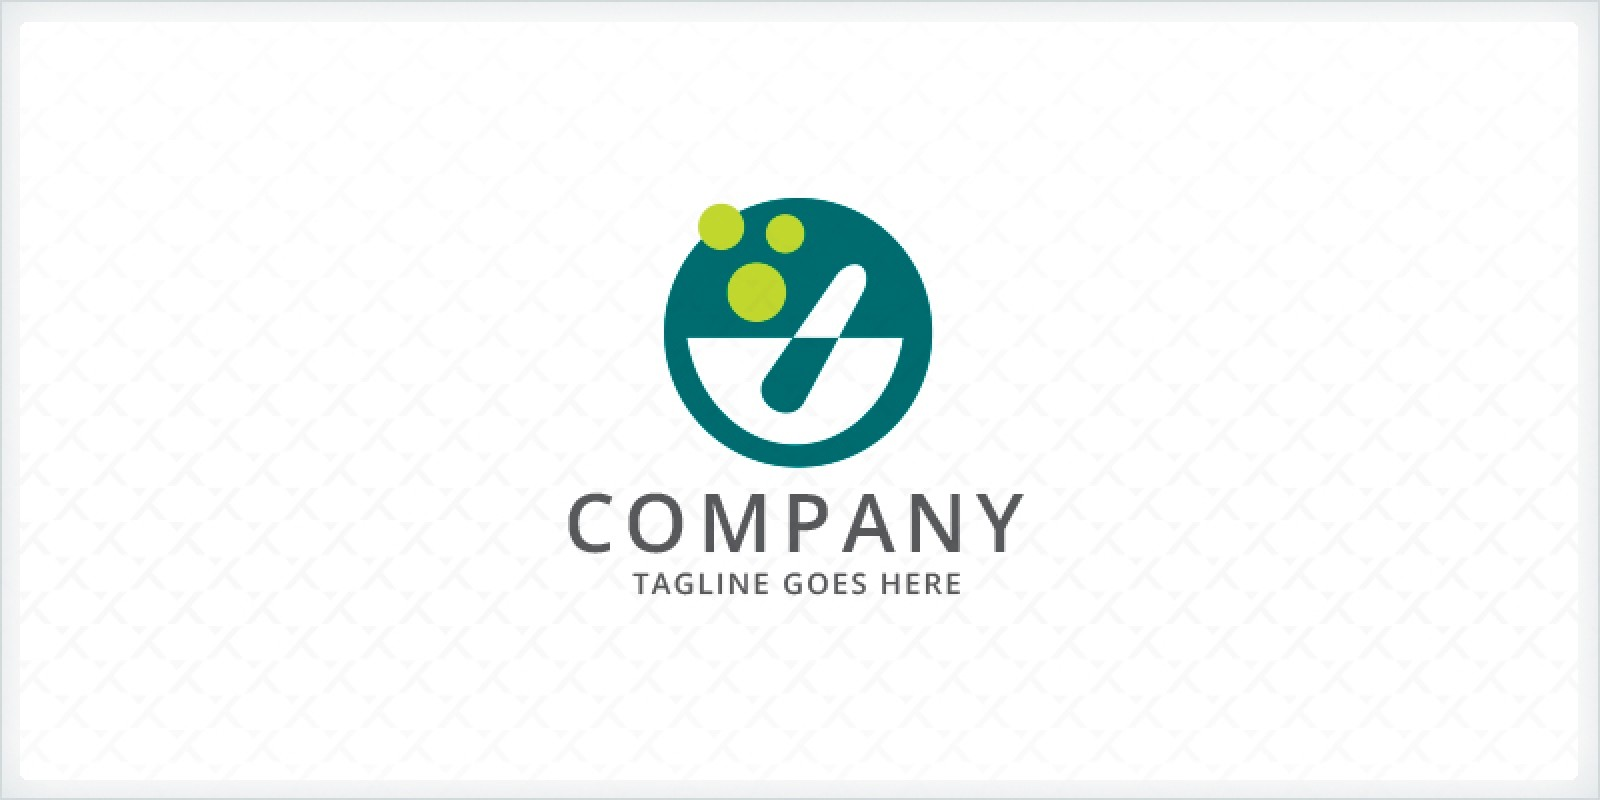 Pharmacy - Mortar and Pestle Logo